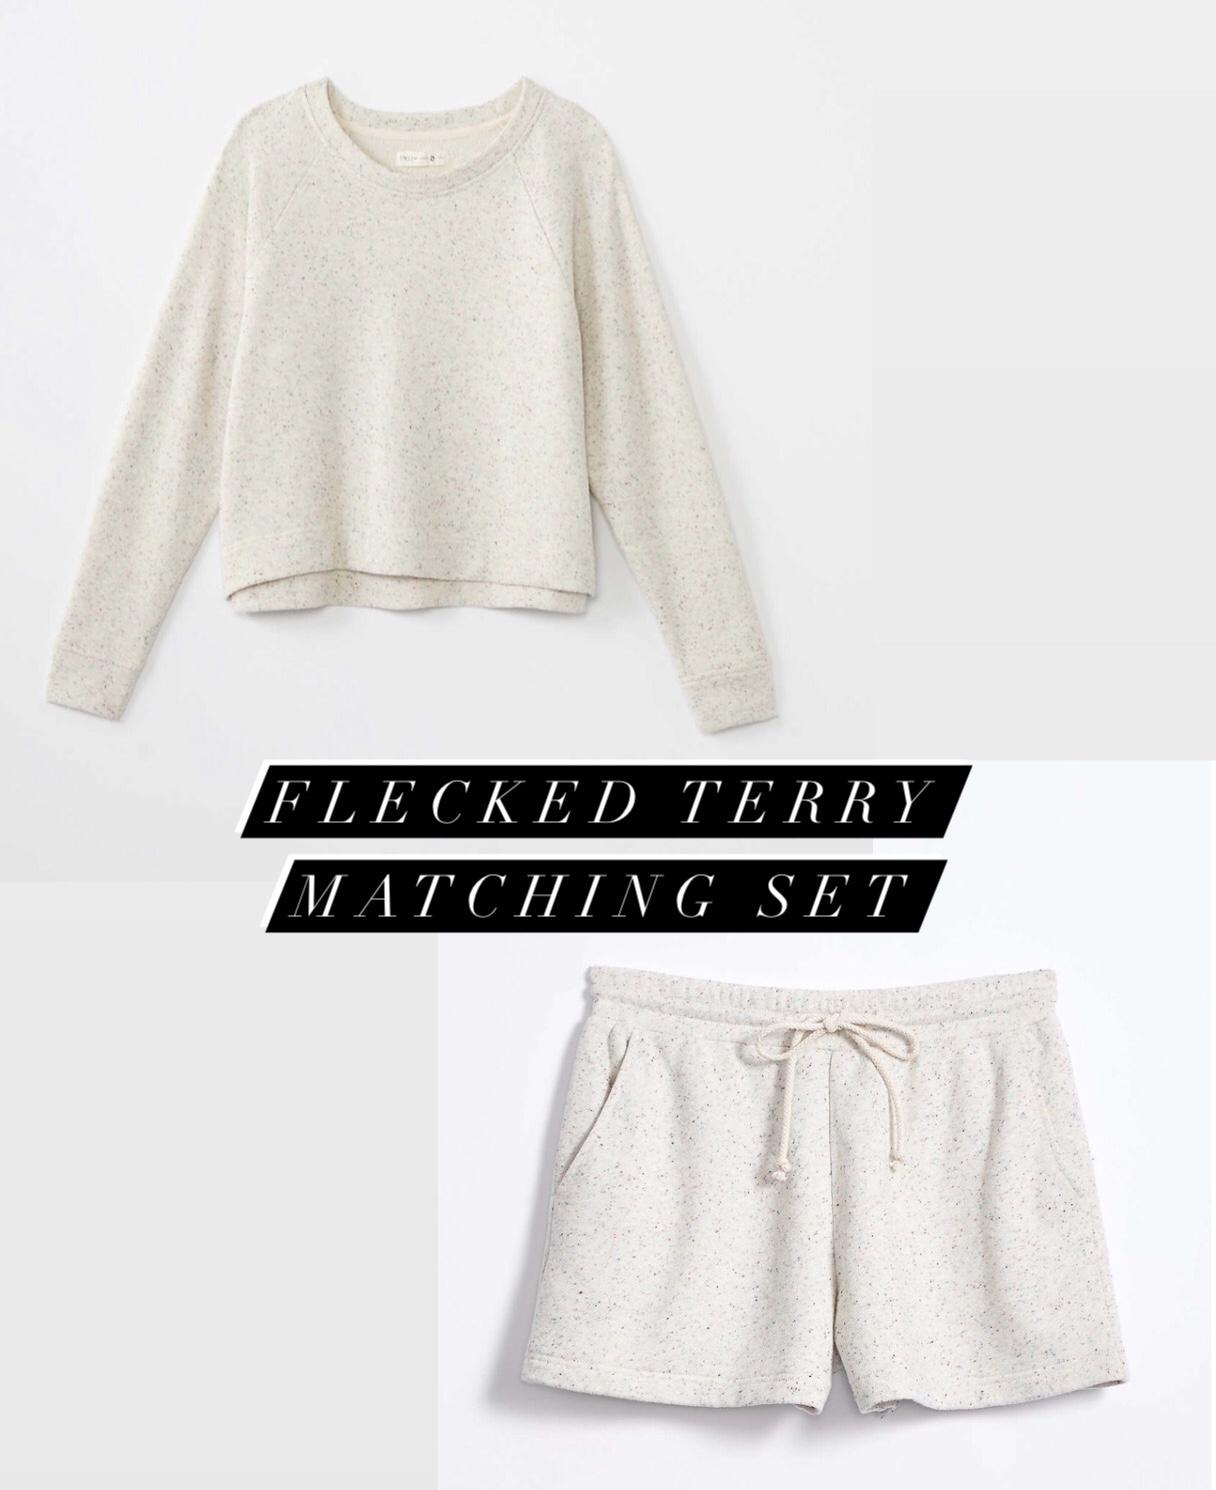 Lou & Grey Flecked Terry Matching Set